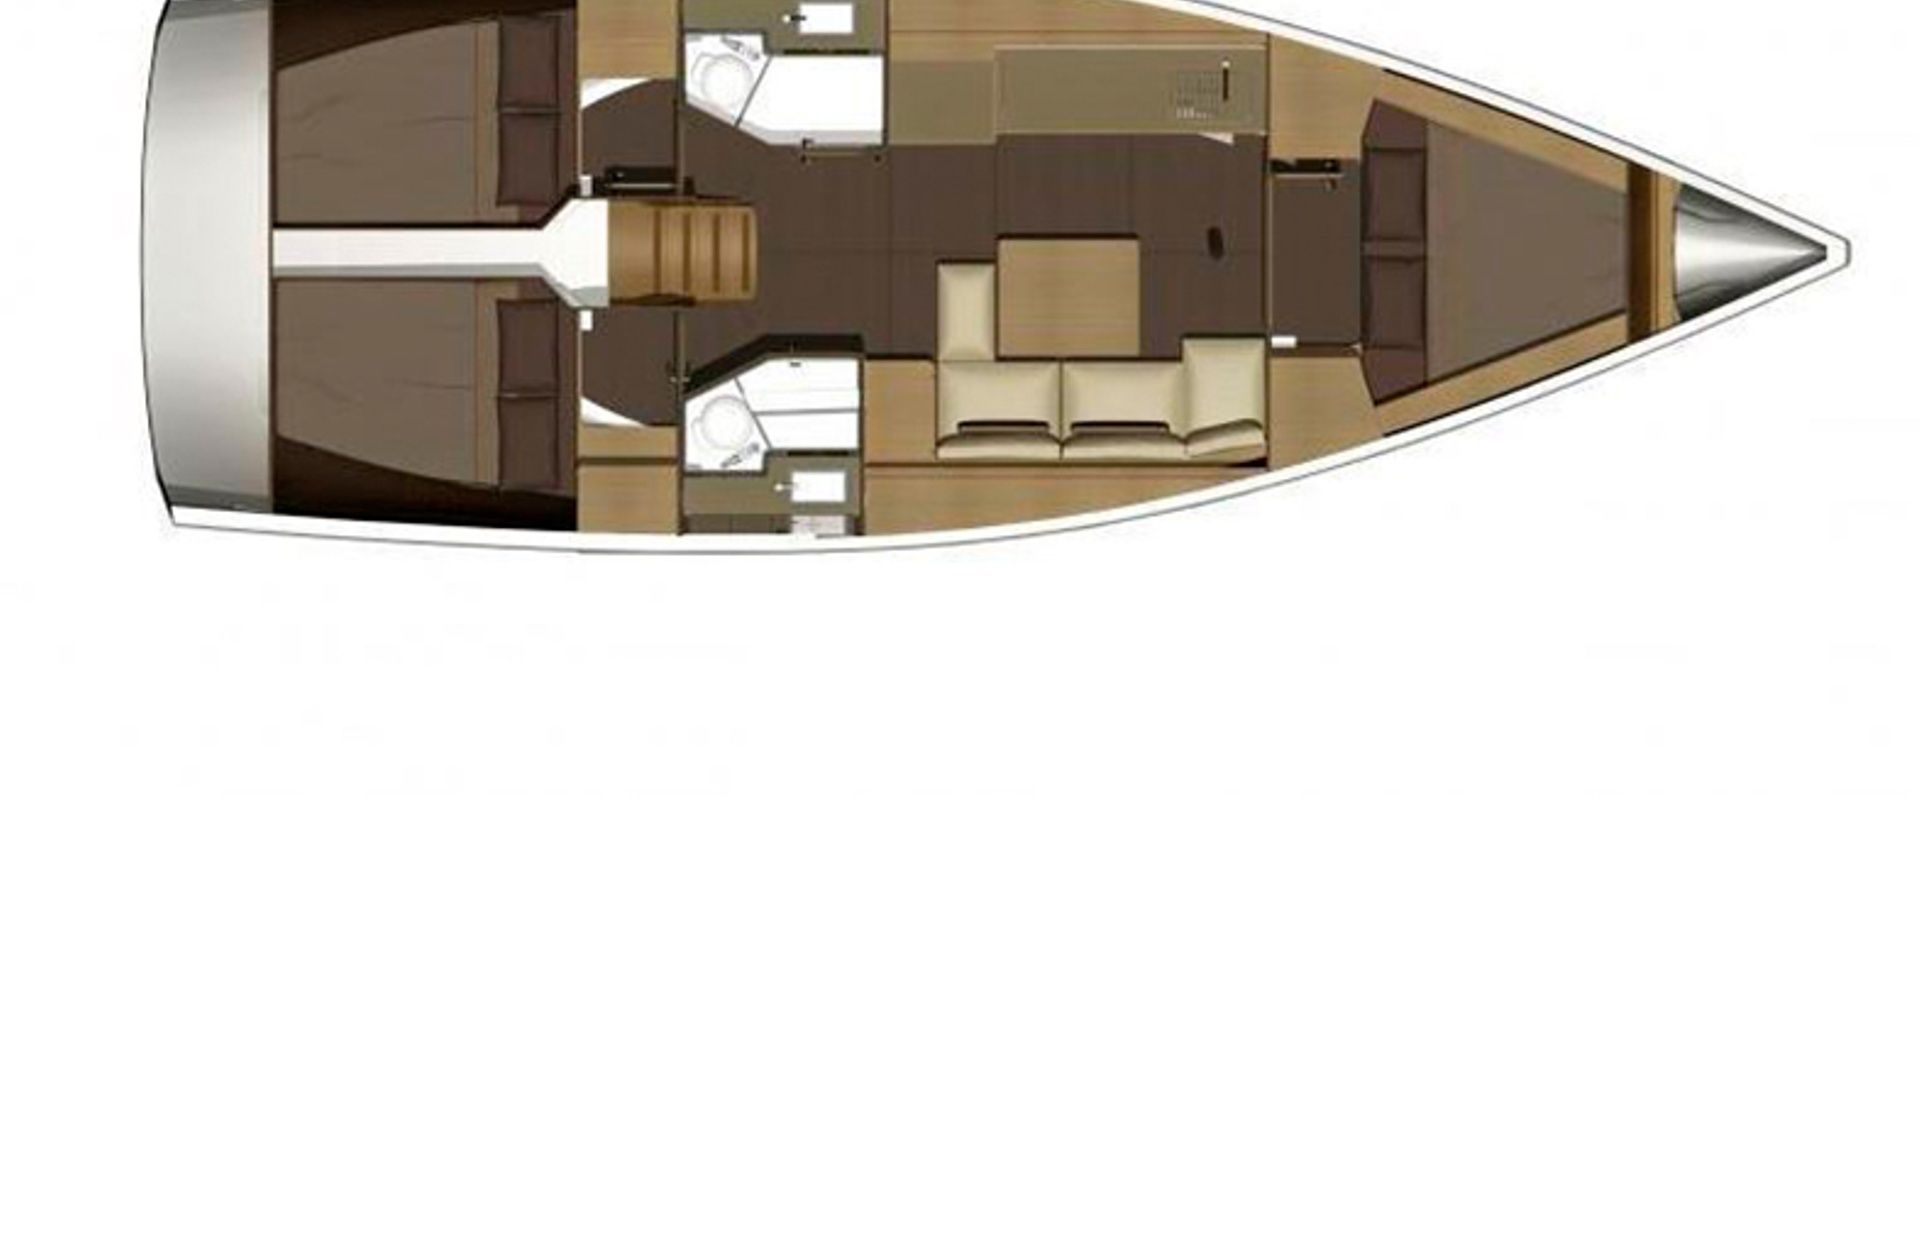 https://media.insailing.com/boat/dufour-382-gl/image_1583773218930.jpg